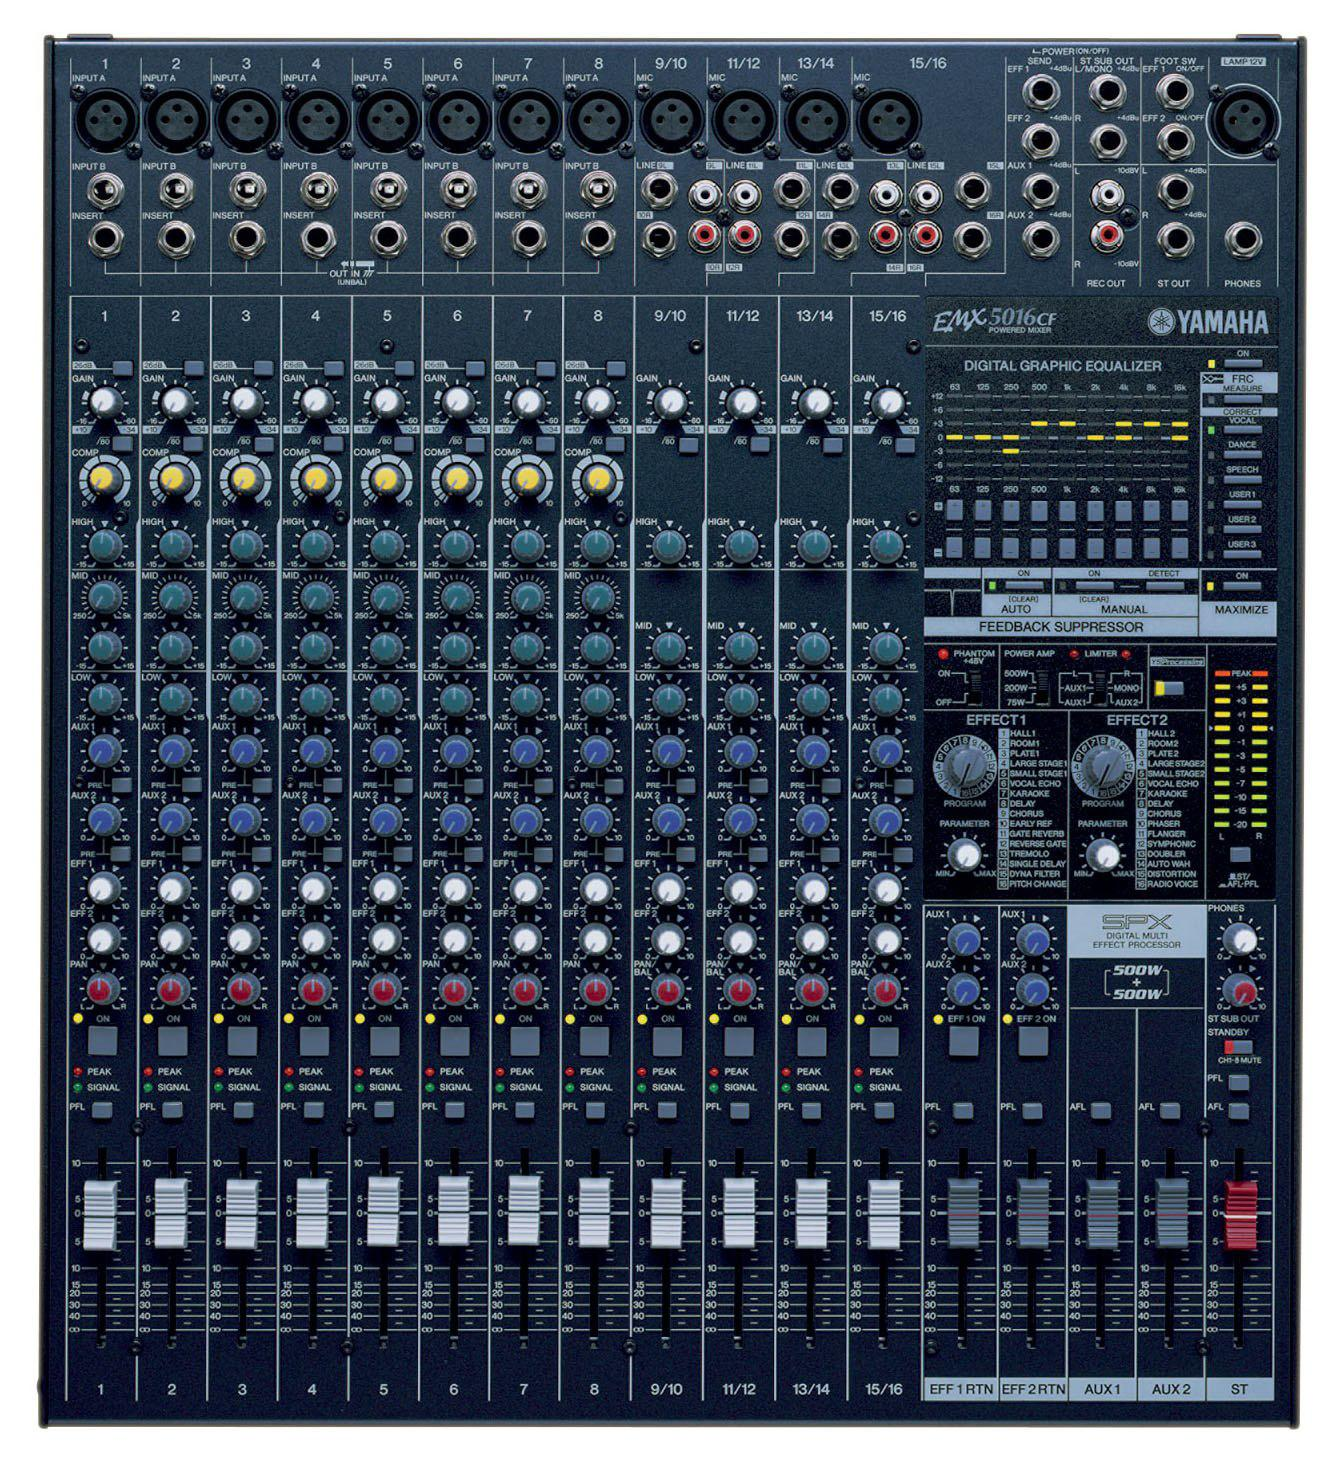 Yamaha EMX 5016 CF Powermischer, 16 Kanal